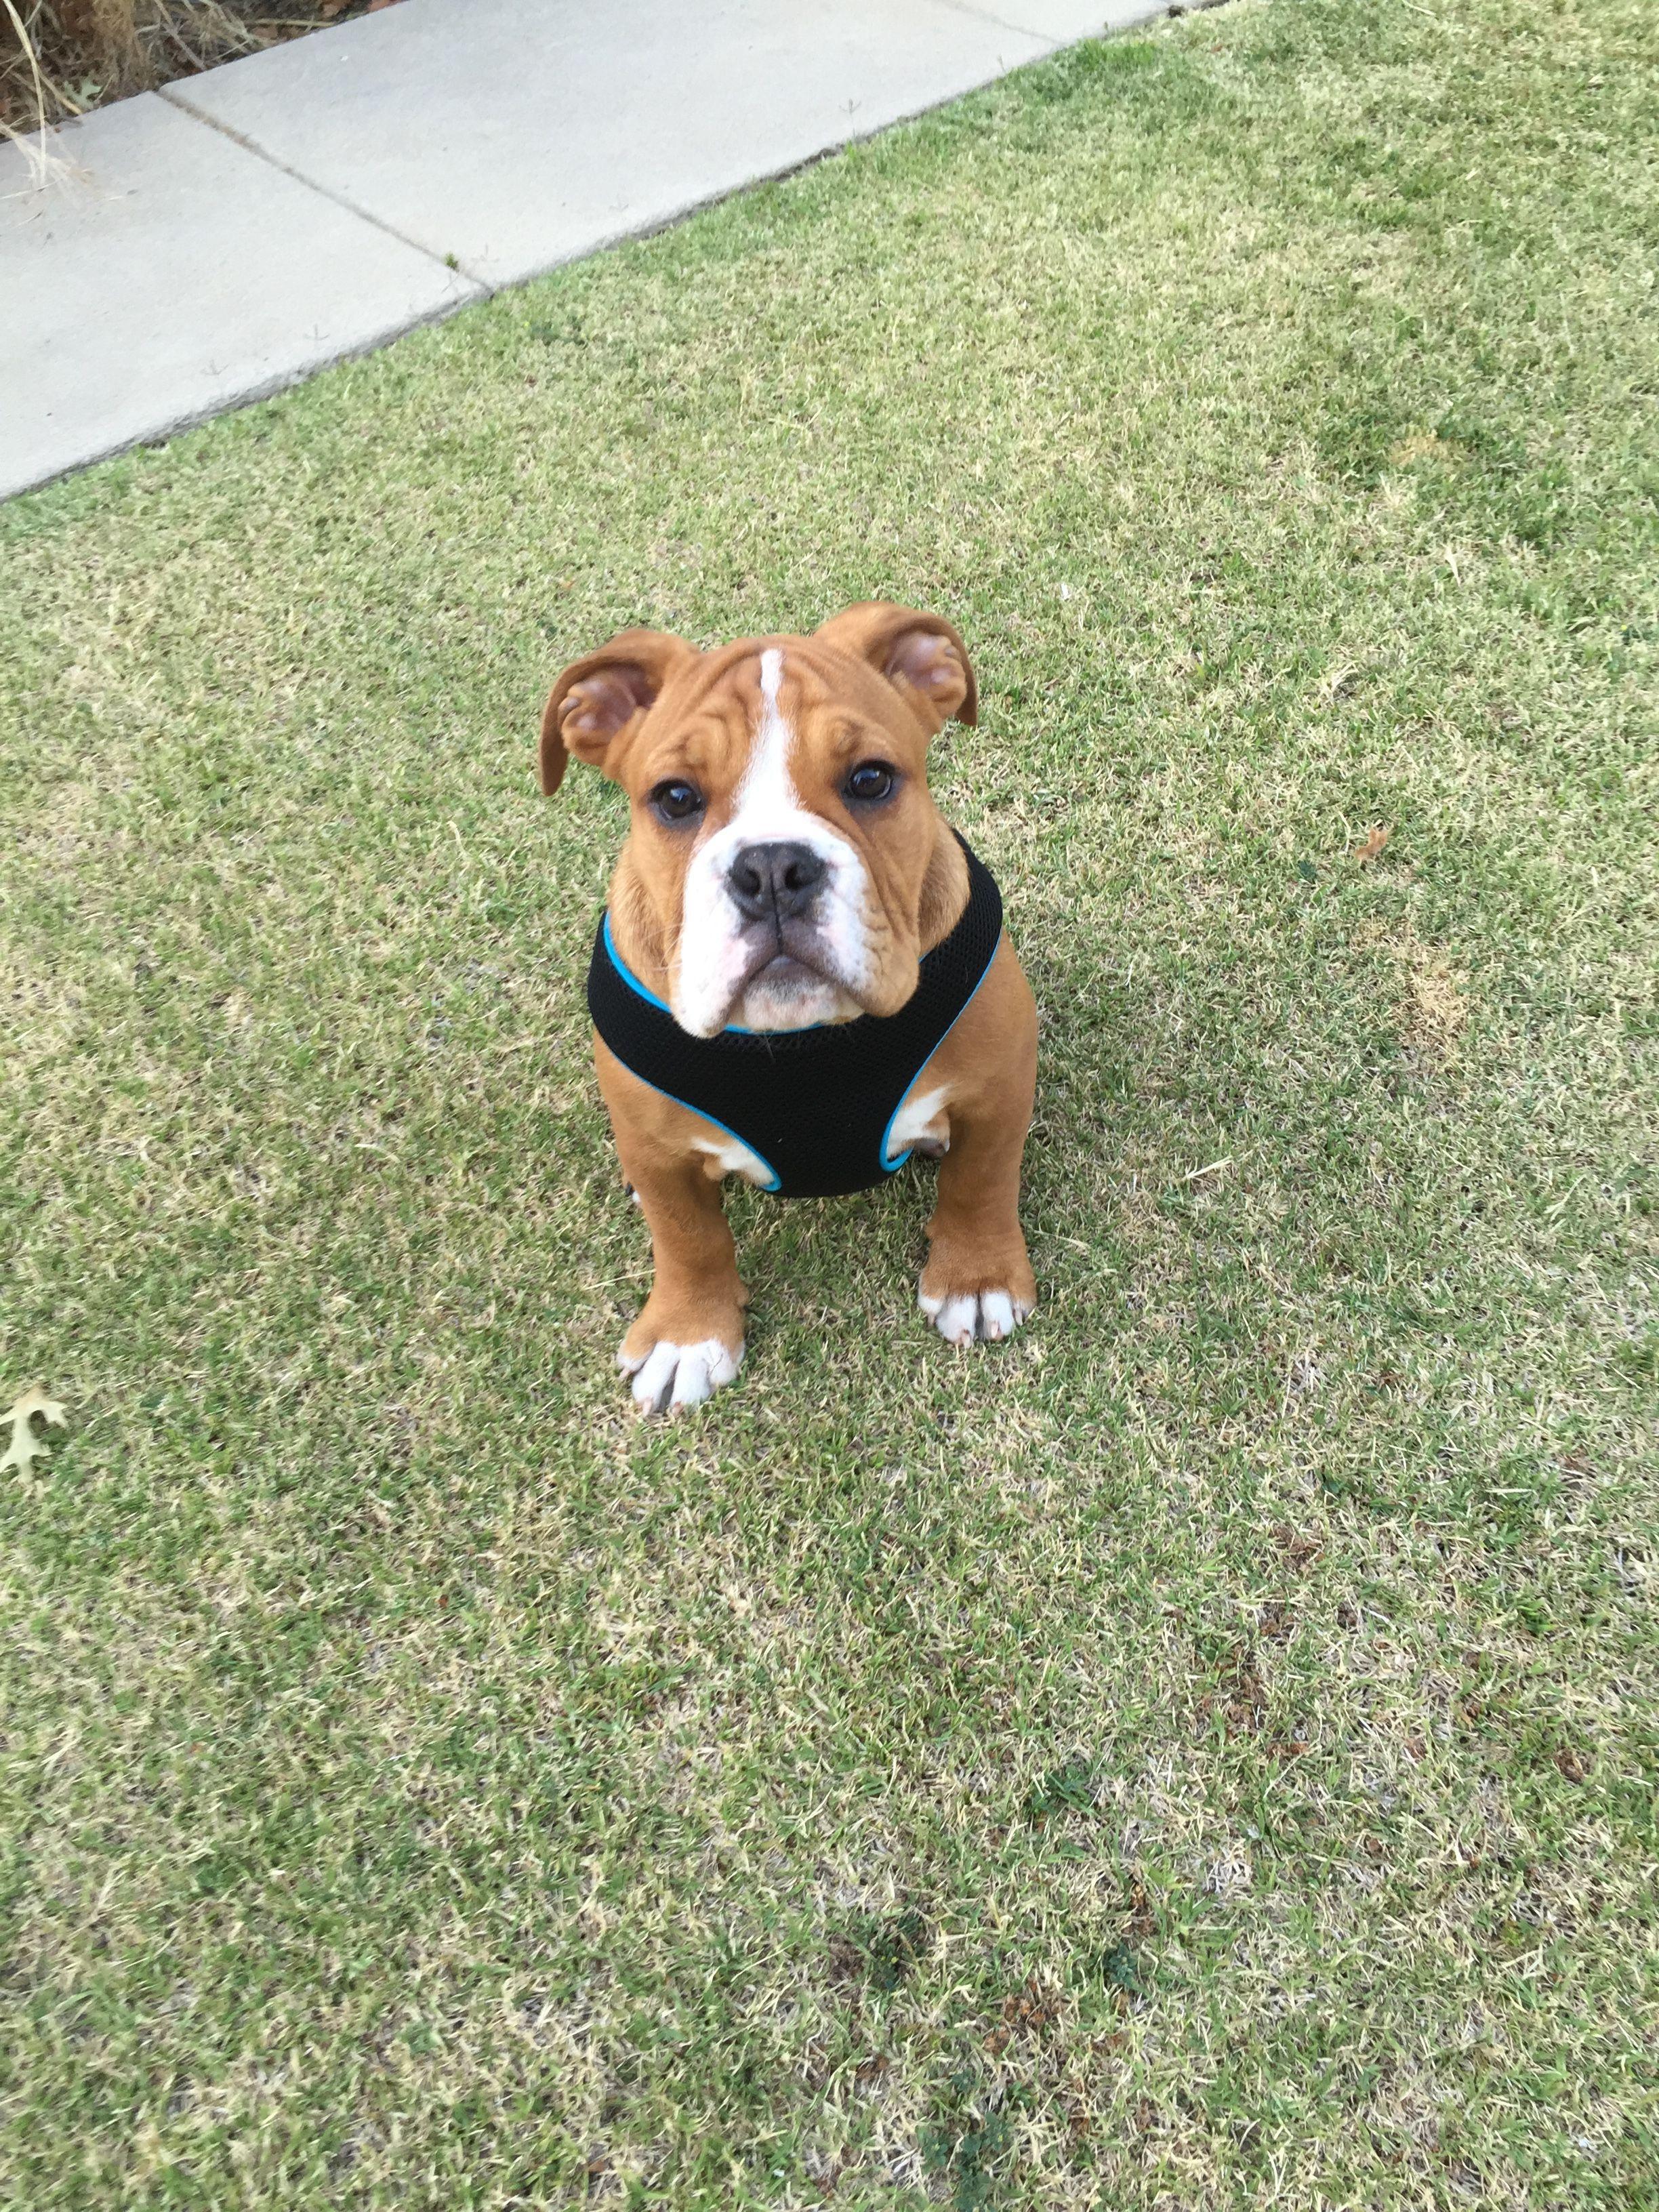 Victorian Bulldog victorianbulldog Bully breeds dogs